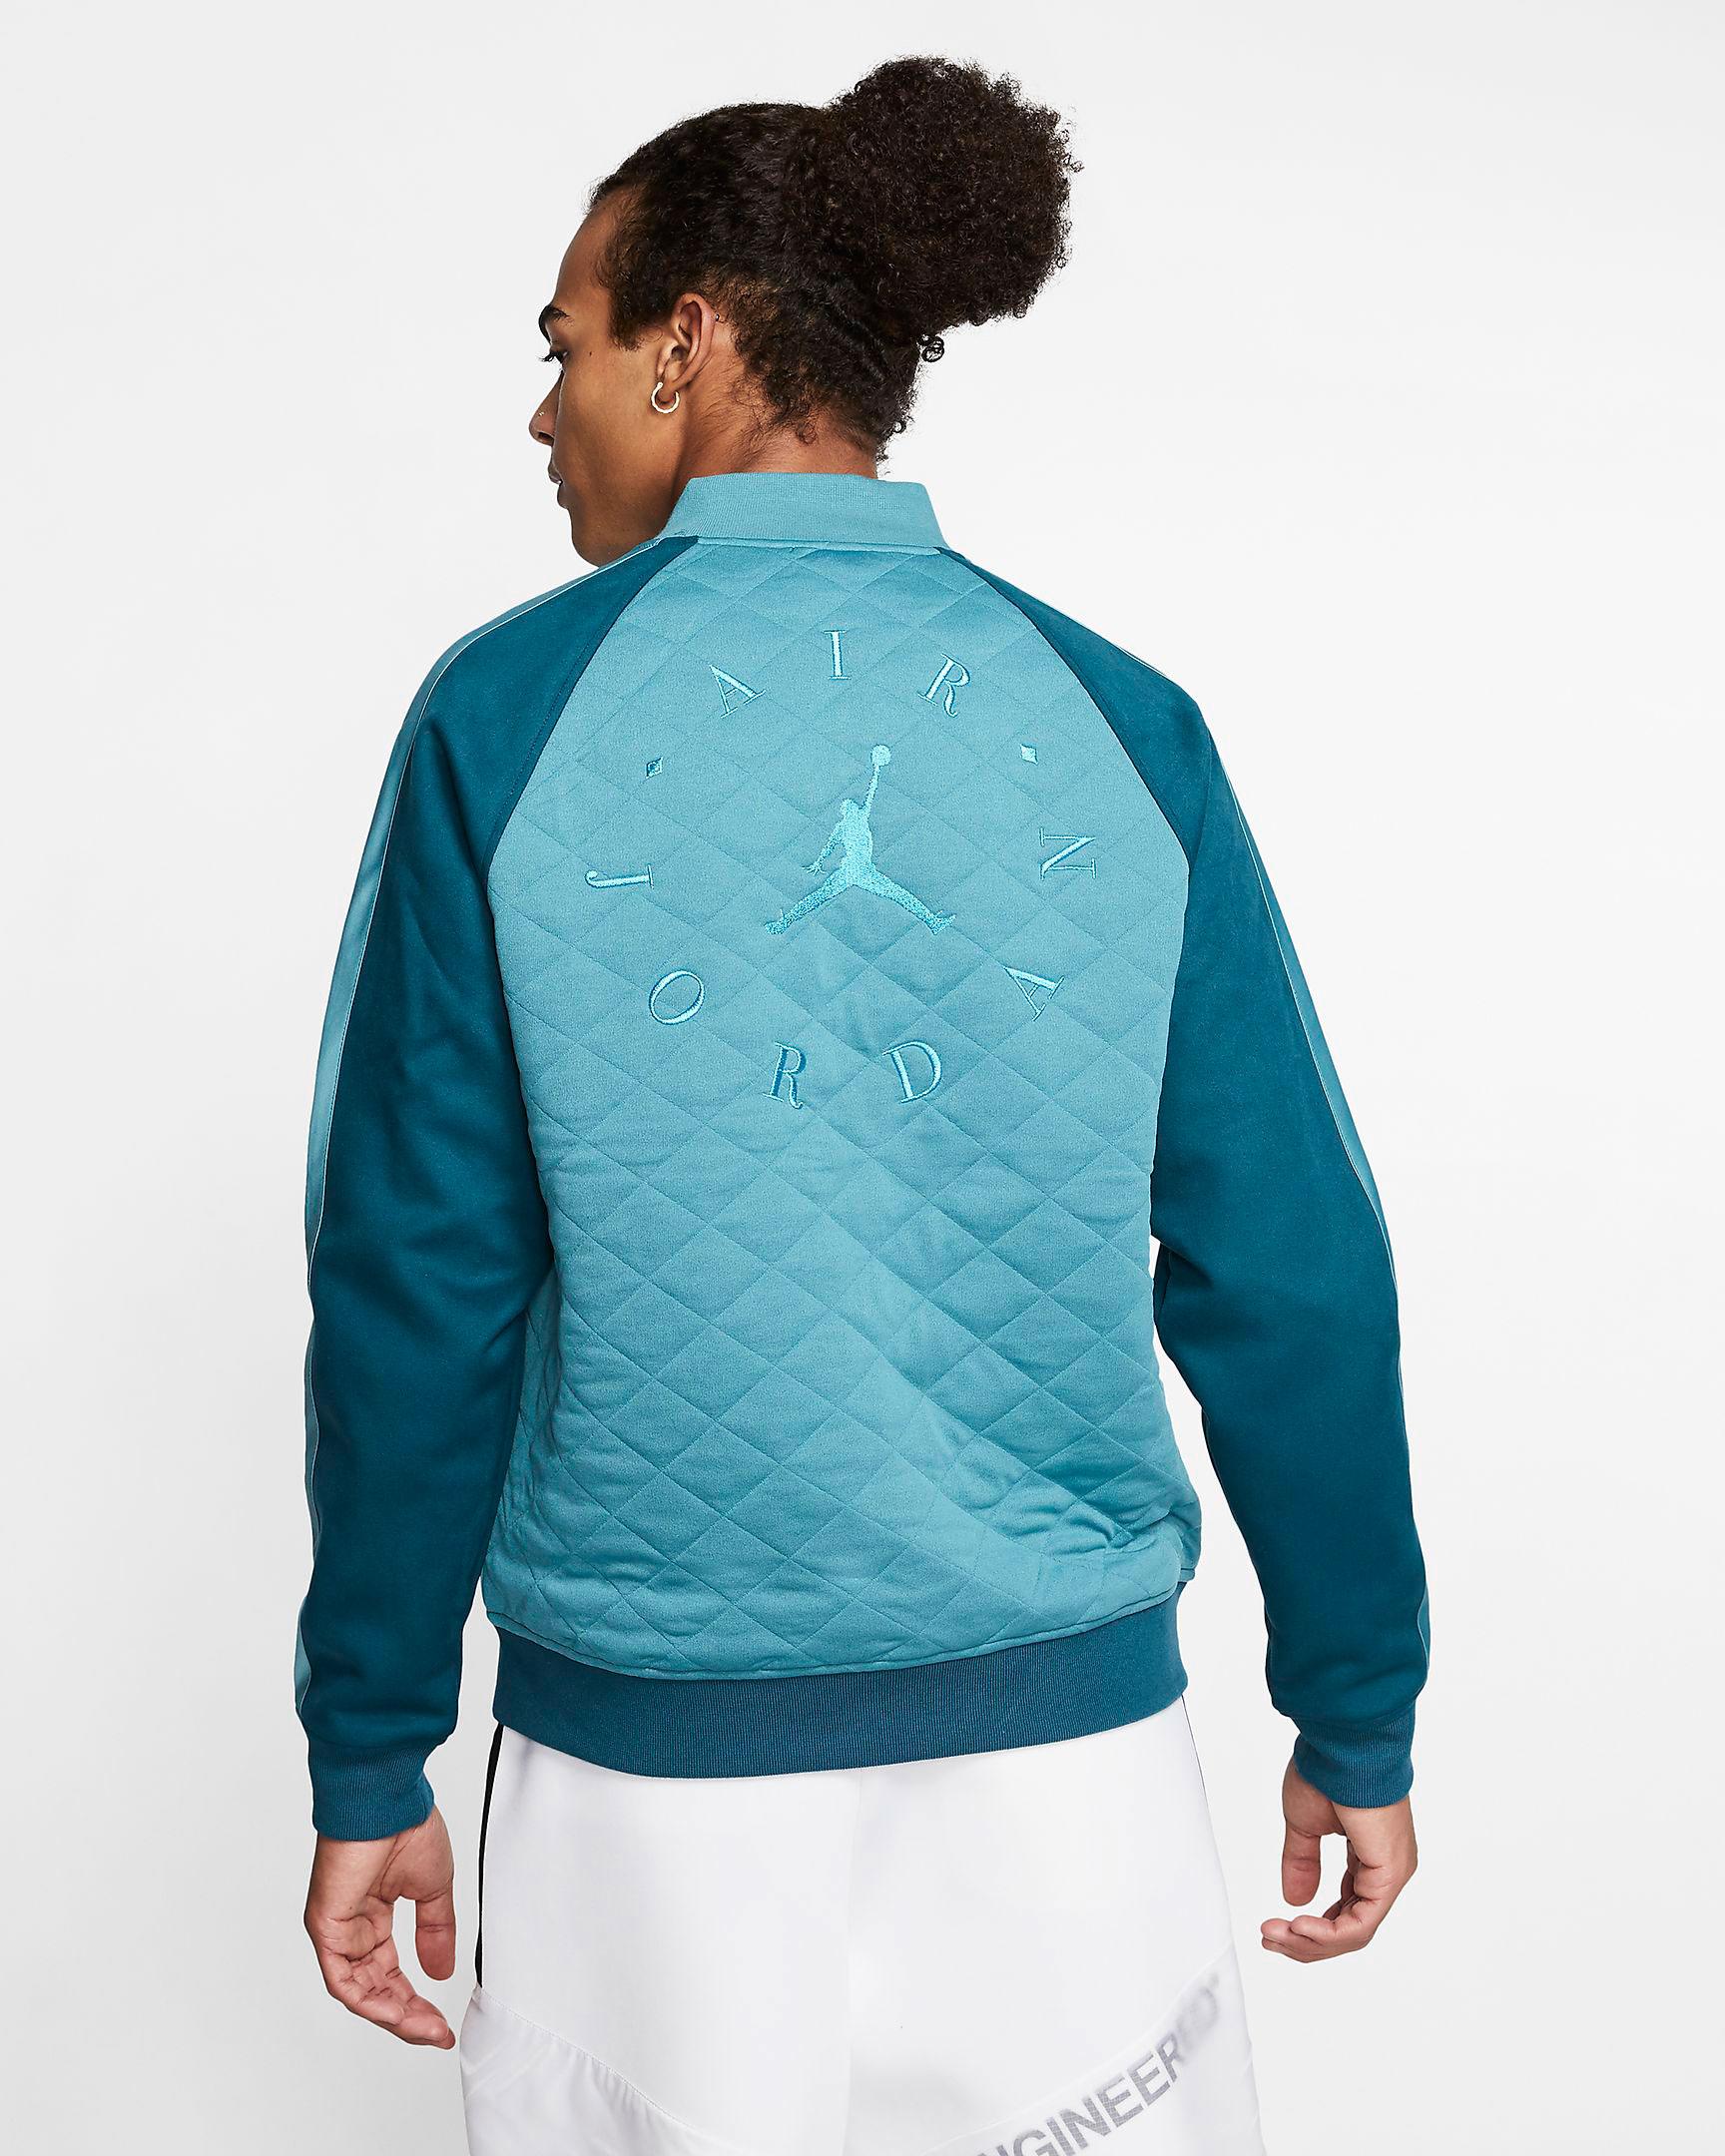 jordan-island-green-jacket-2